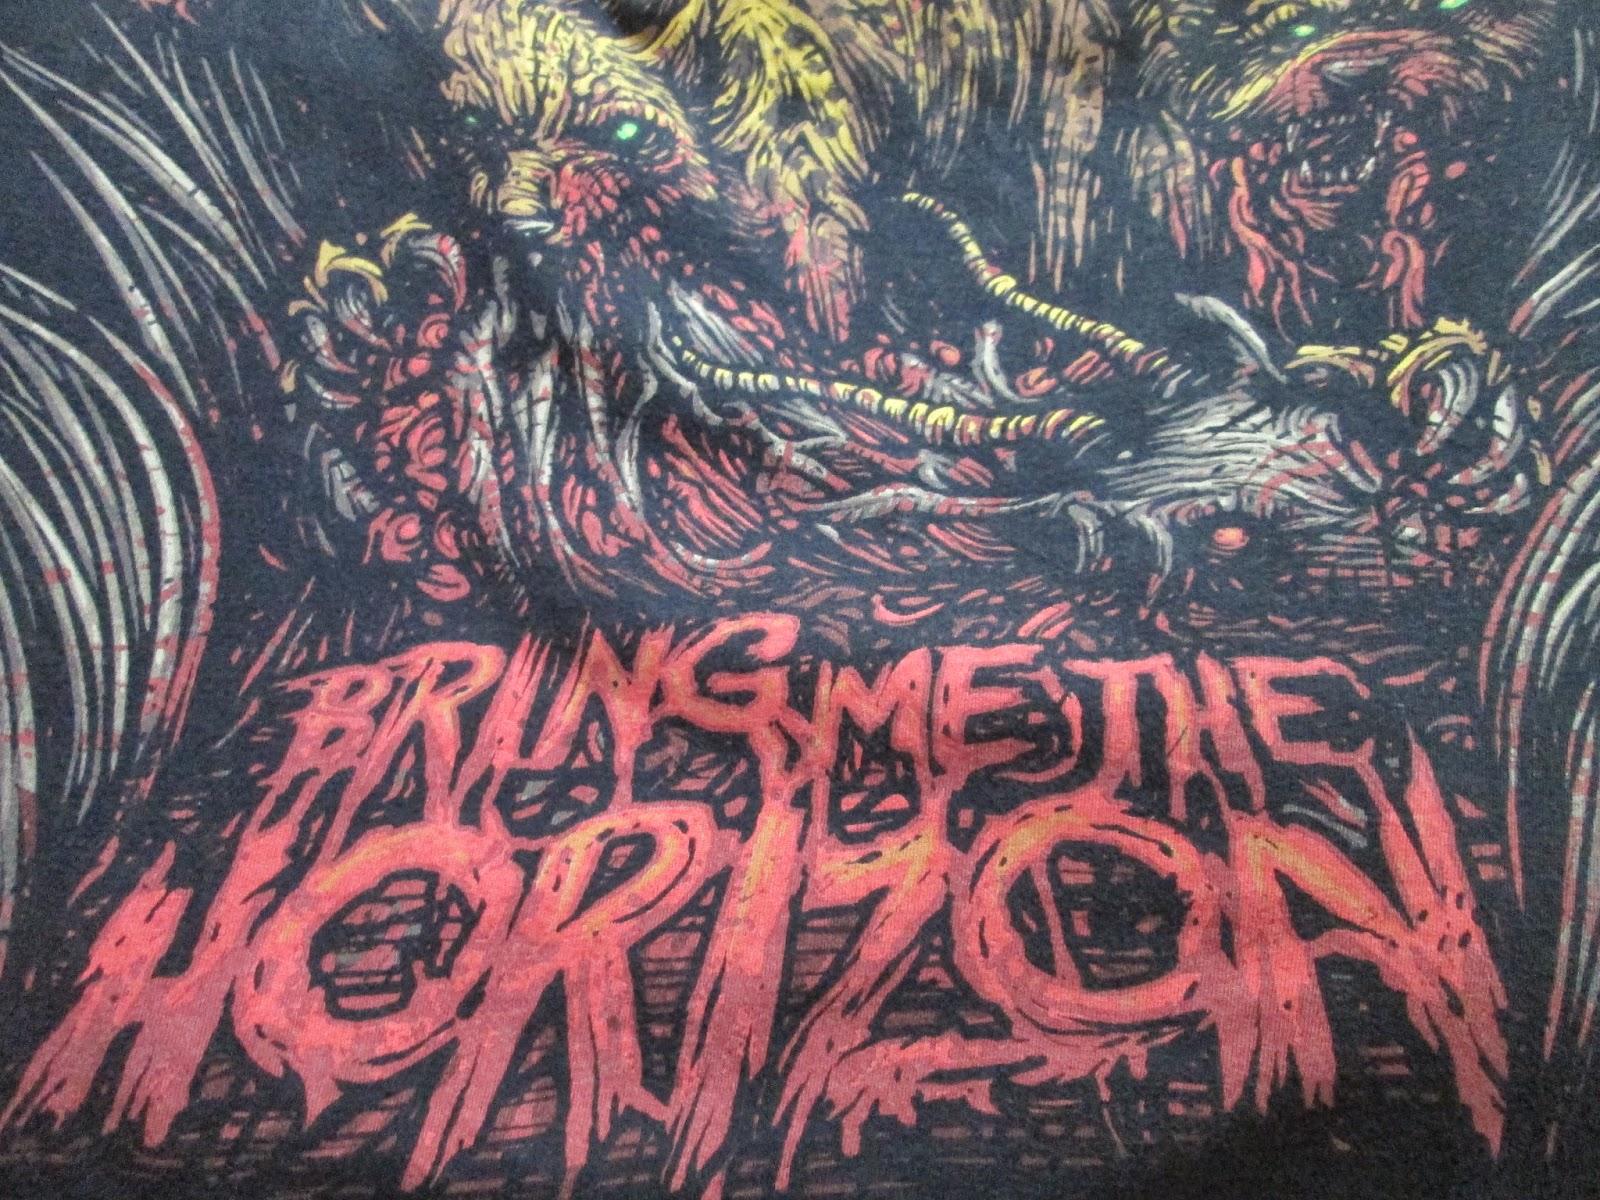 Bring me the horizon shirt 2014